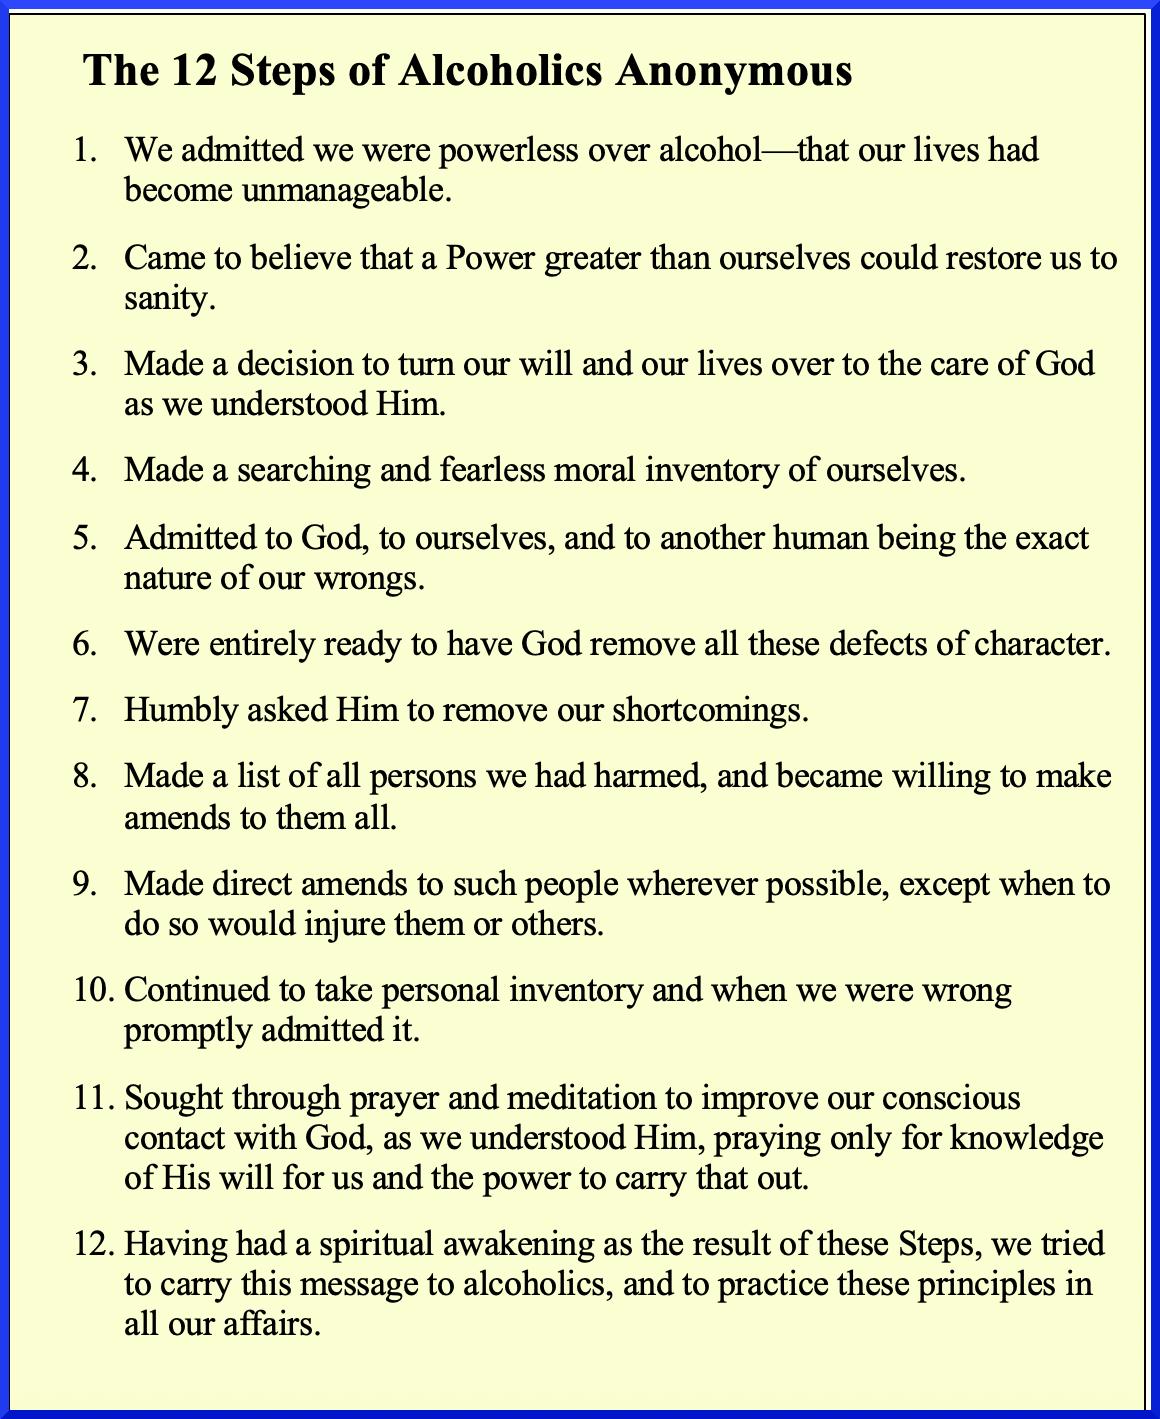 The 12 Steps Backward